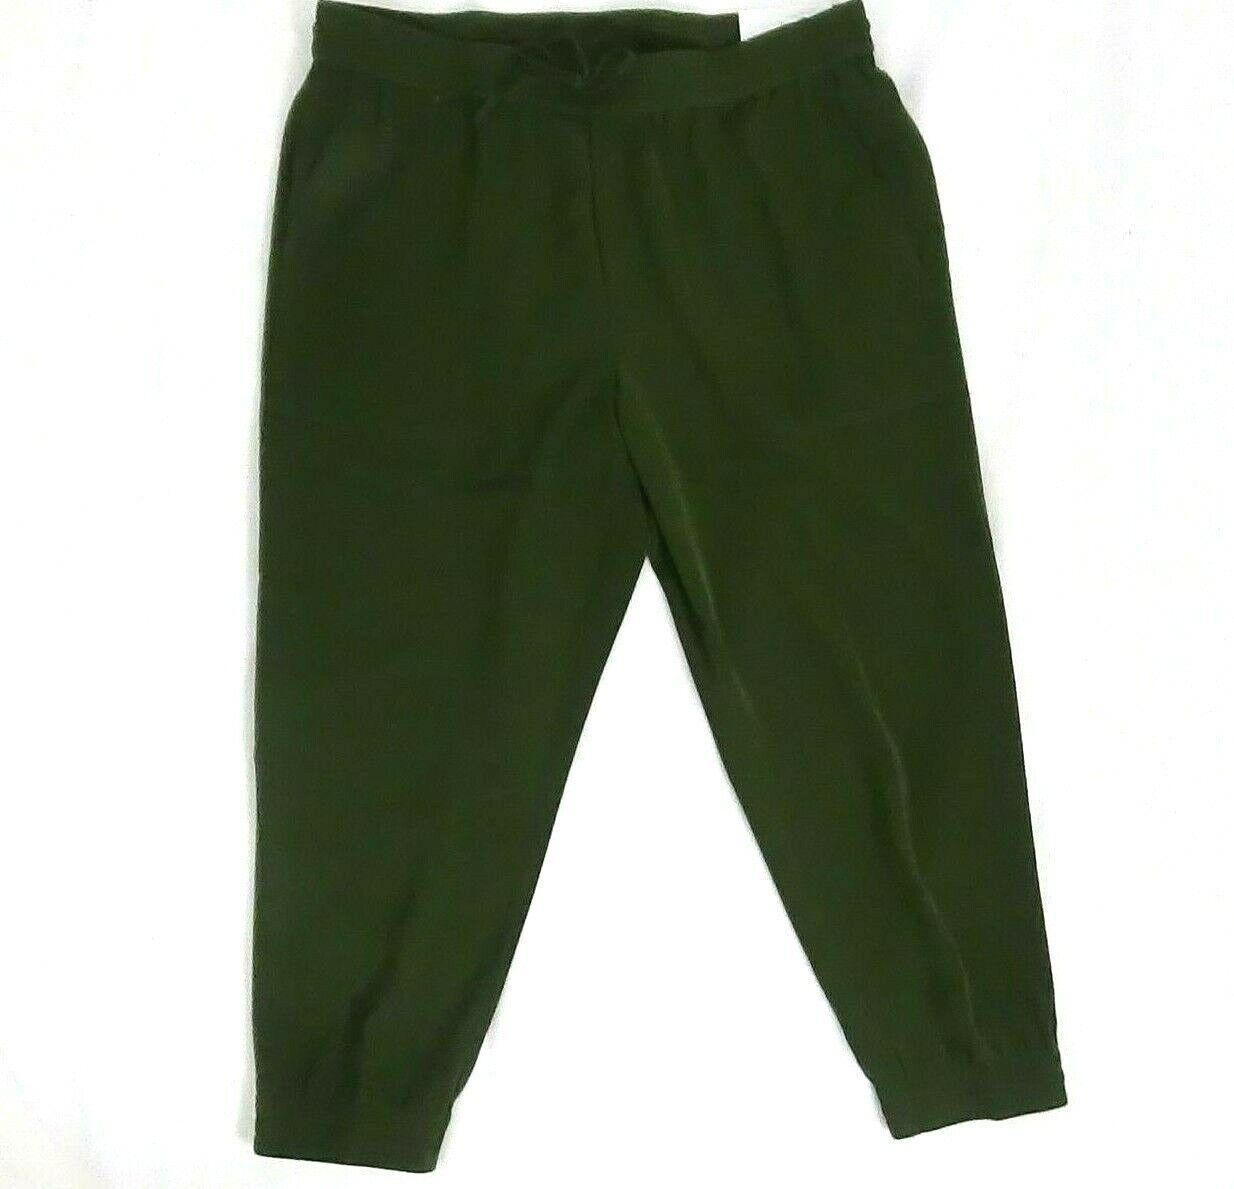 79.99 Ann Taylor Factory Women Jogger Pants Green Olive Large Elastic Petite